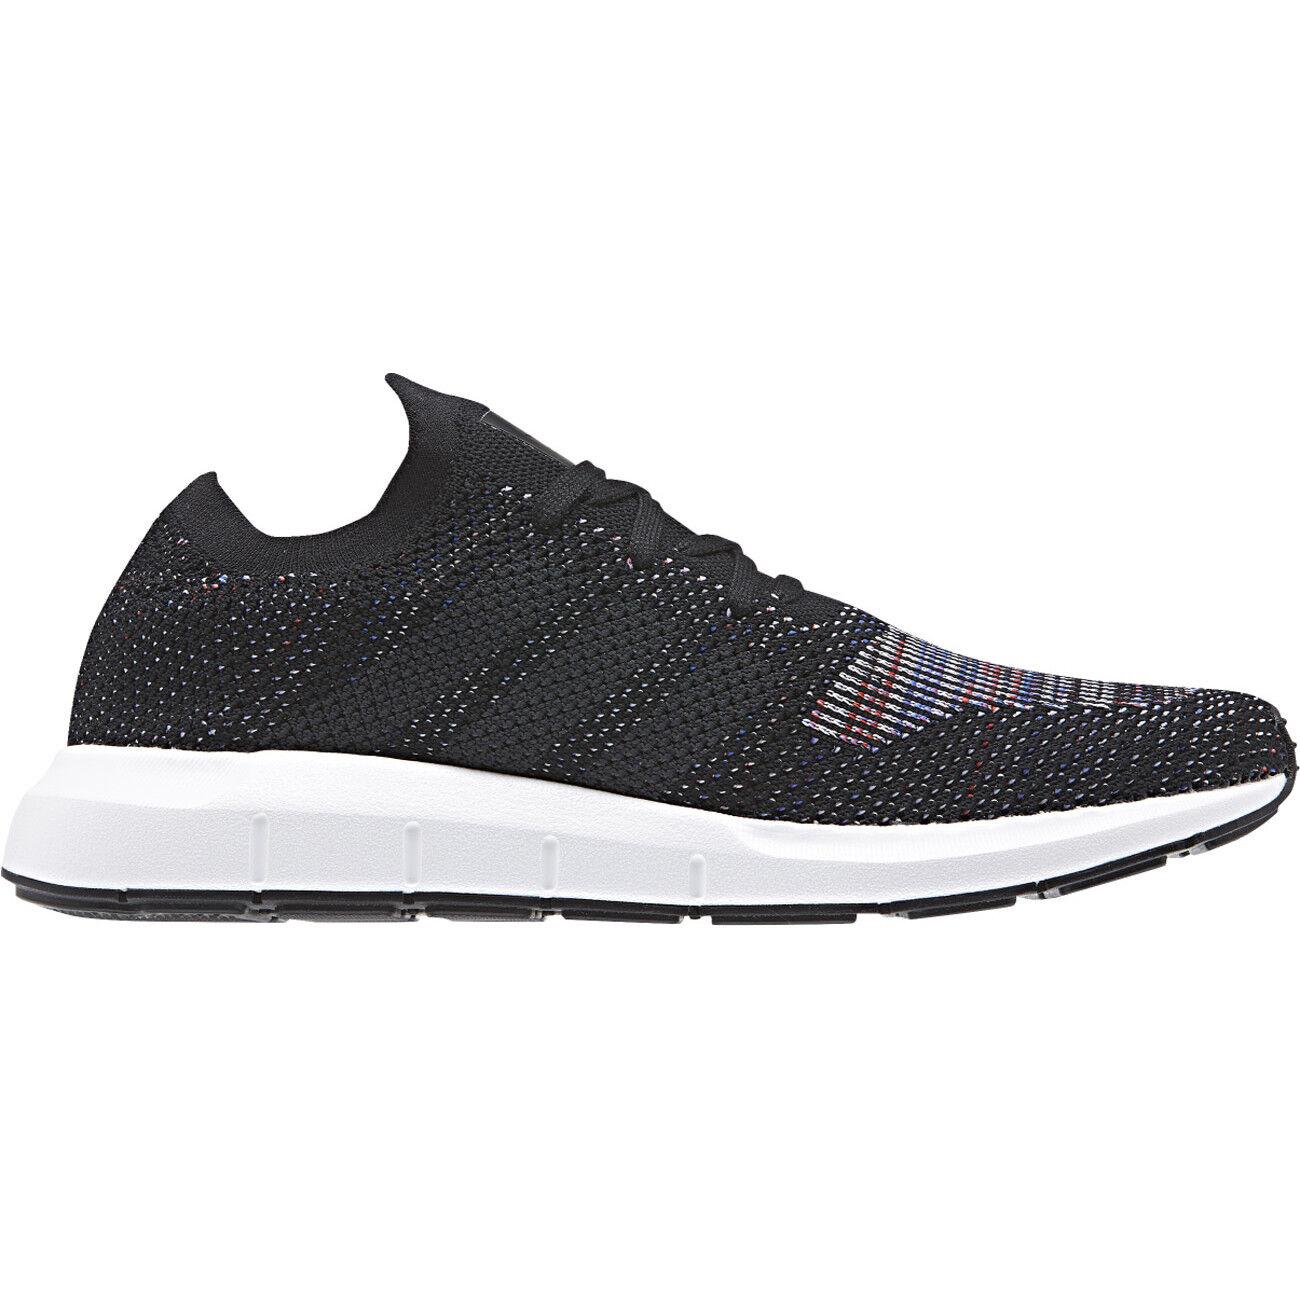 Adidas Originals Herren Sneaker SWIFT RUN PK